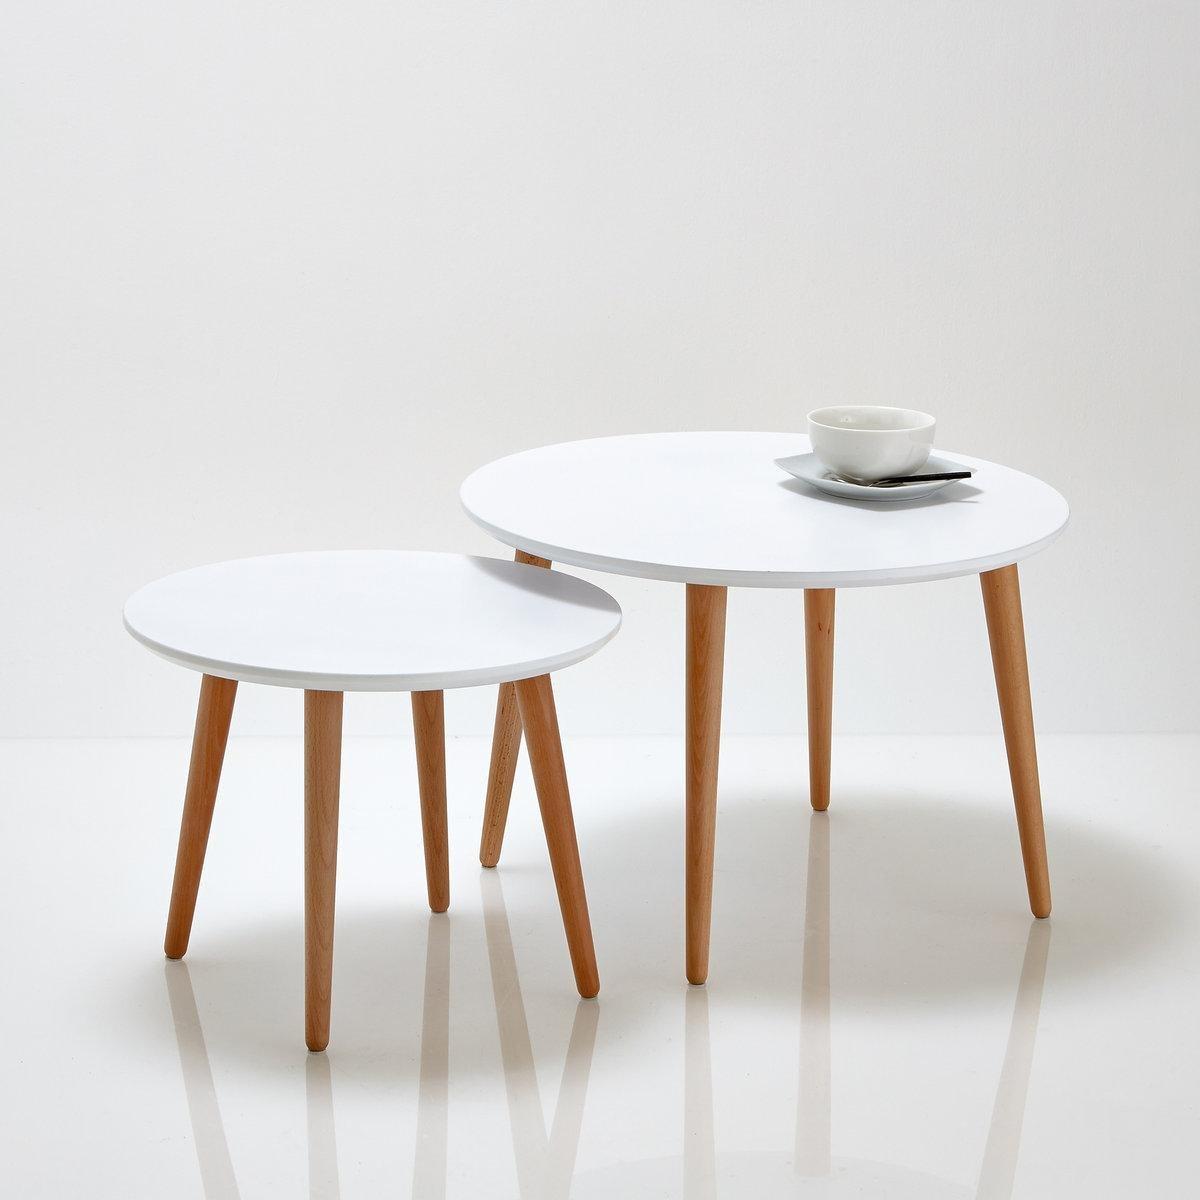 table basse vintage pas cher lille maison. Black Bedroom Furniture Sets. Home Design Ideas